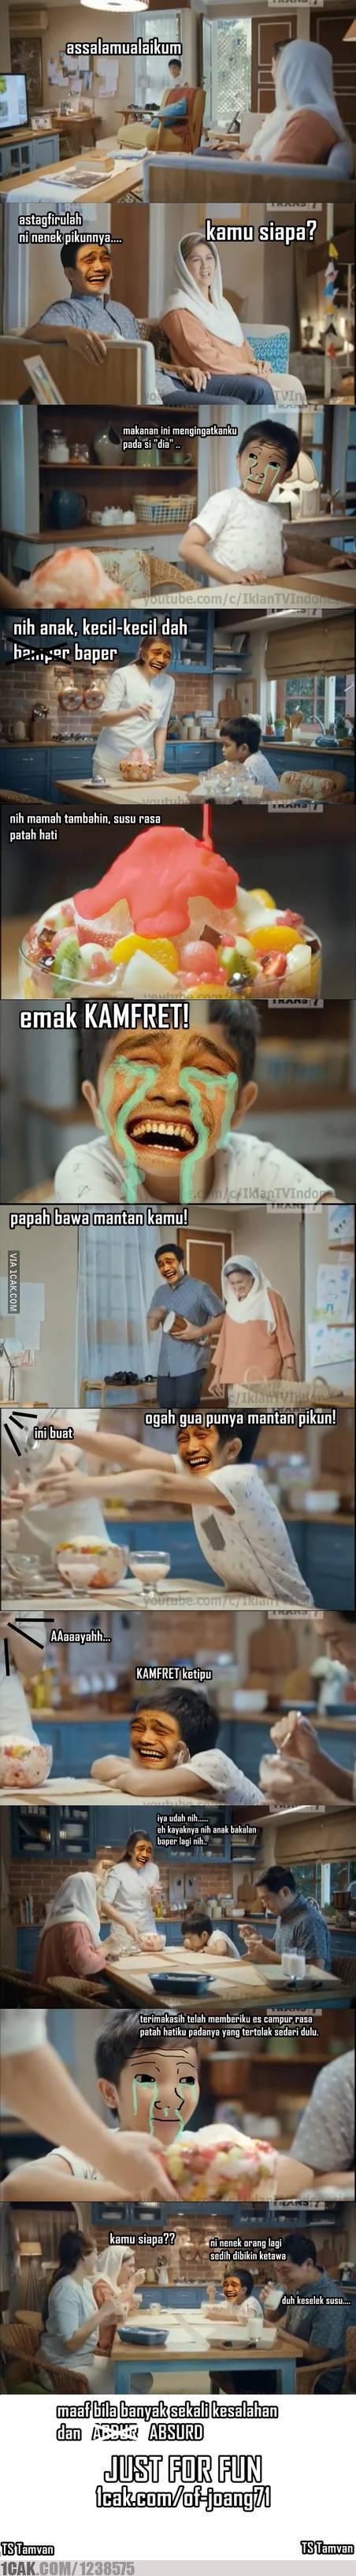 Iklan Susu Bendera Versi 1cak Meme Indonesia Lucu V V Pinterest